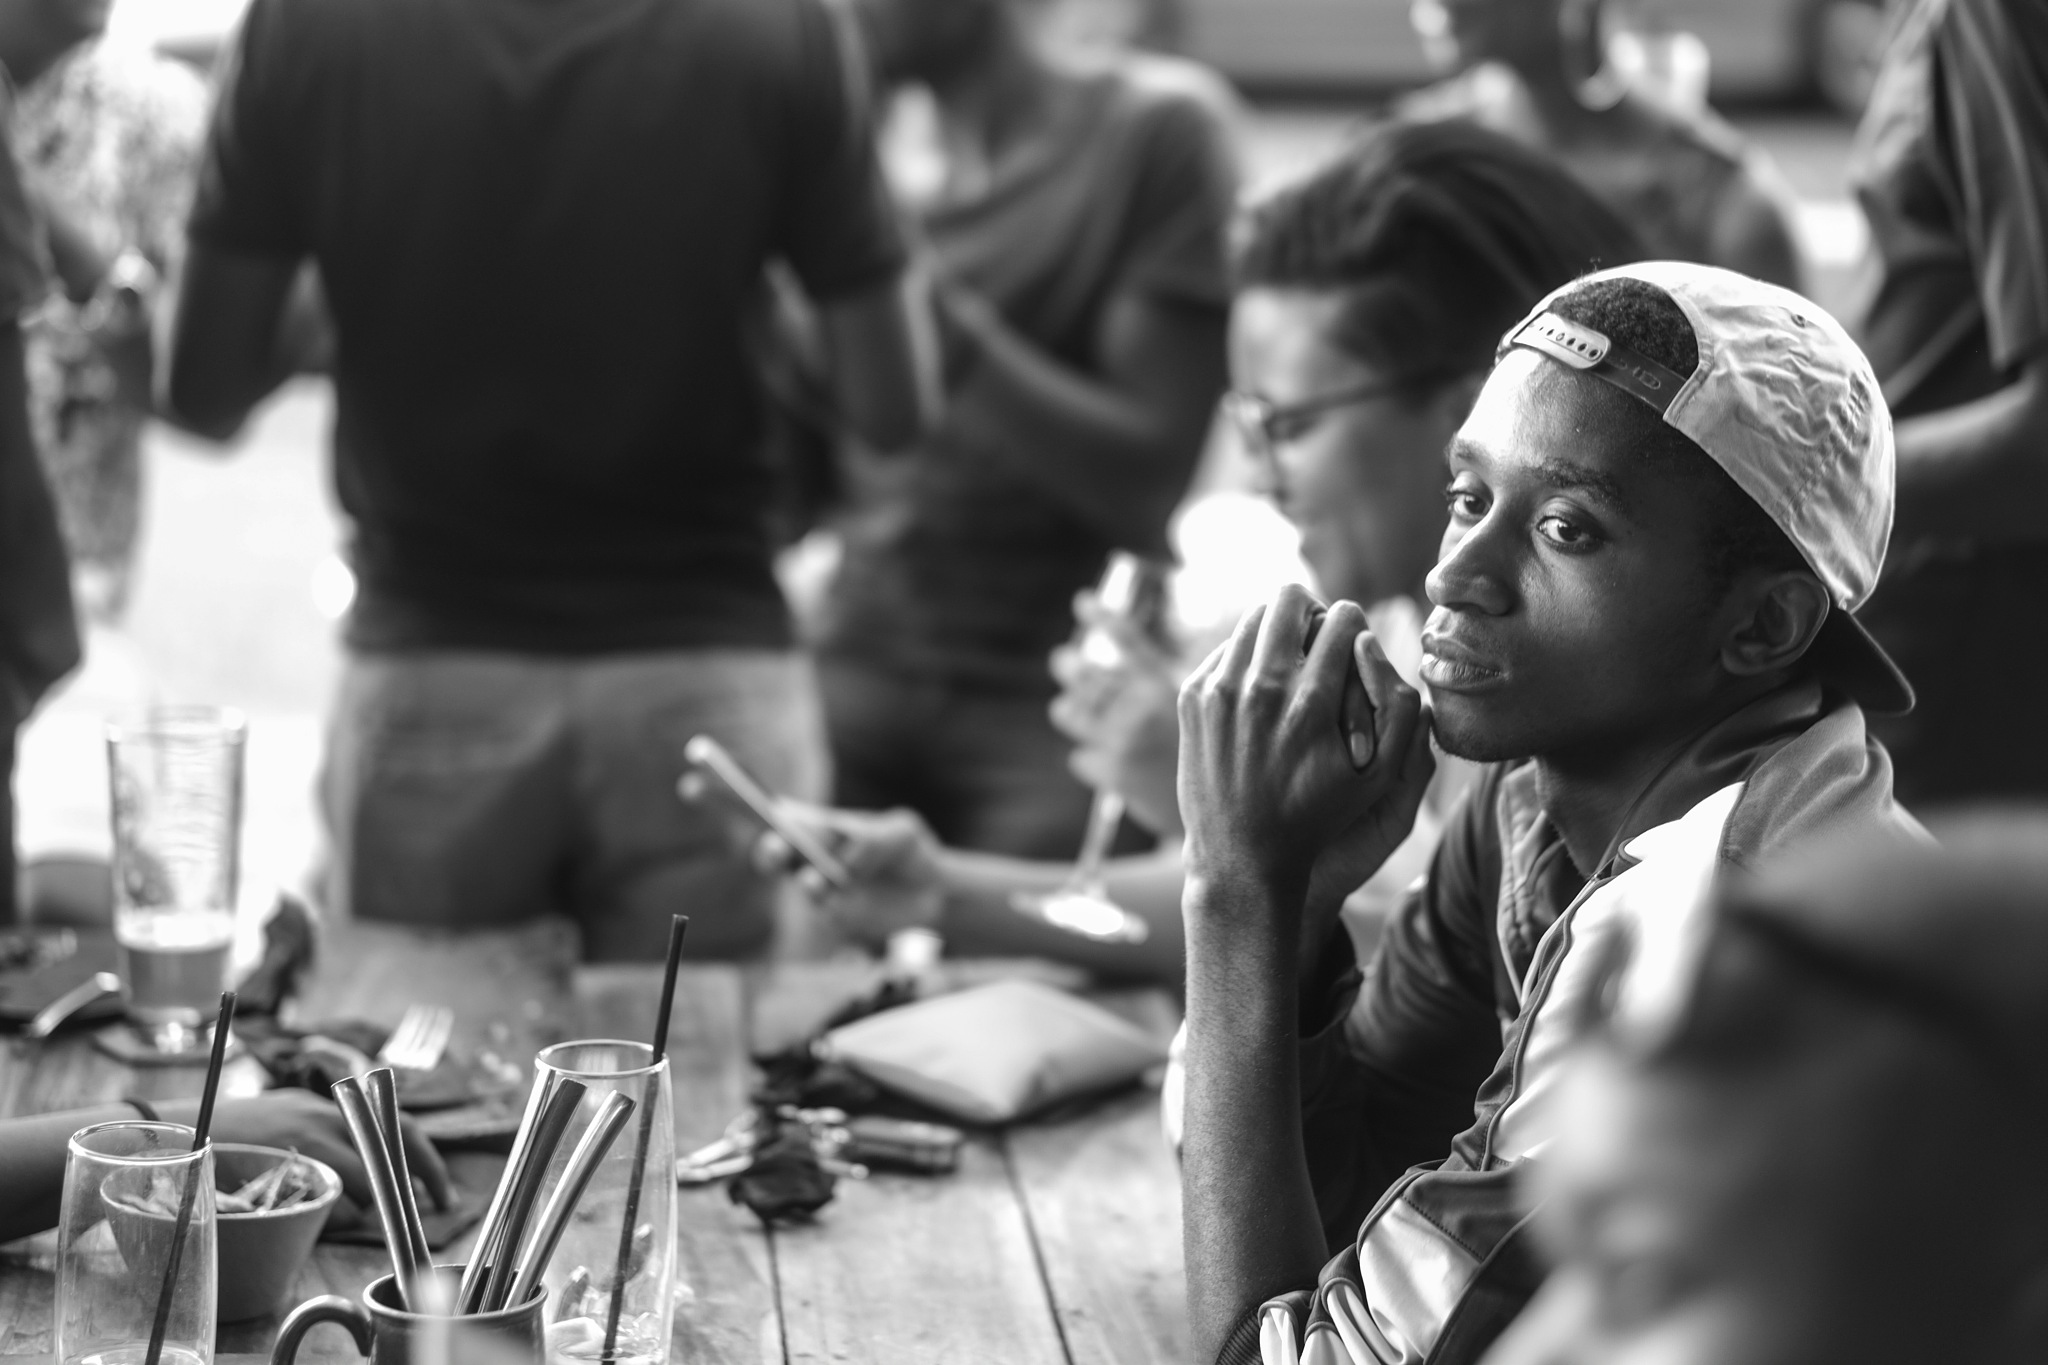 The Art of Contemplation by kurt_Blankenberg